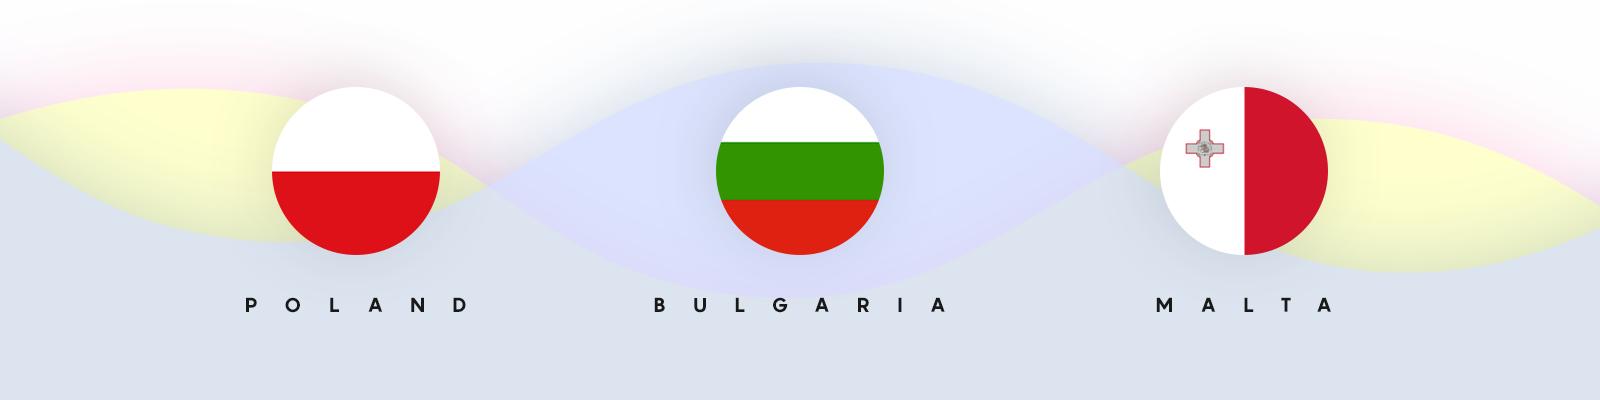 app development company malta